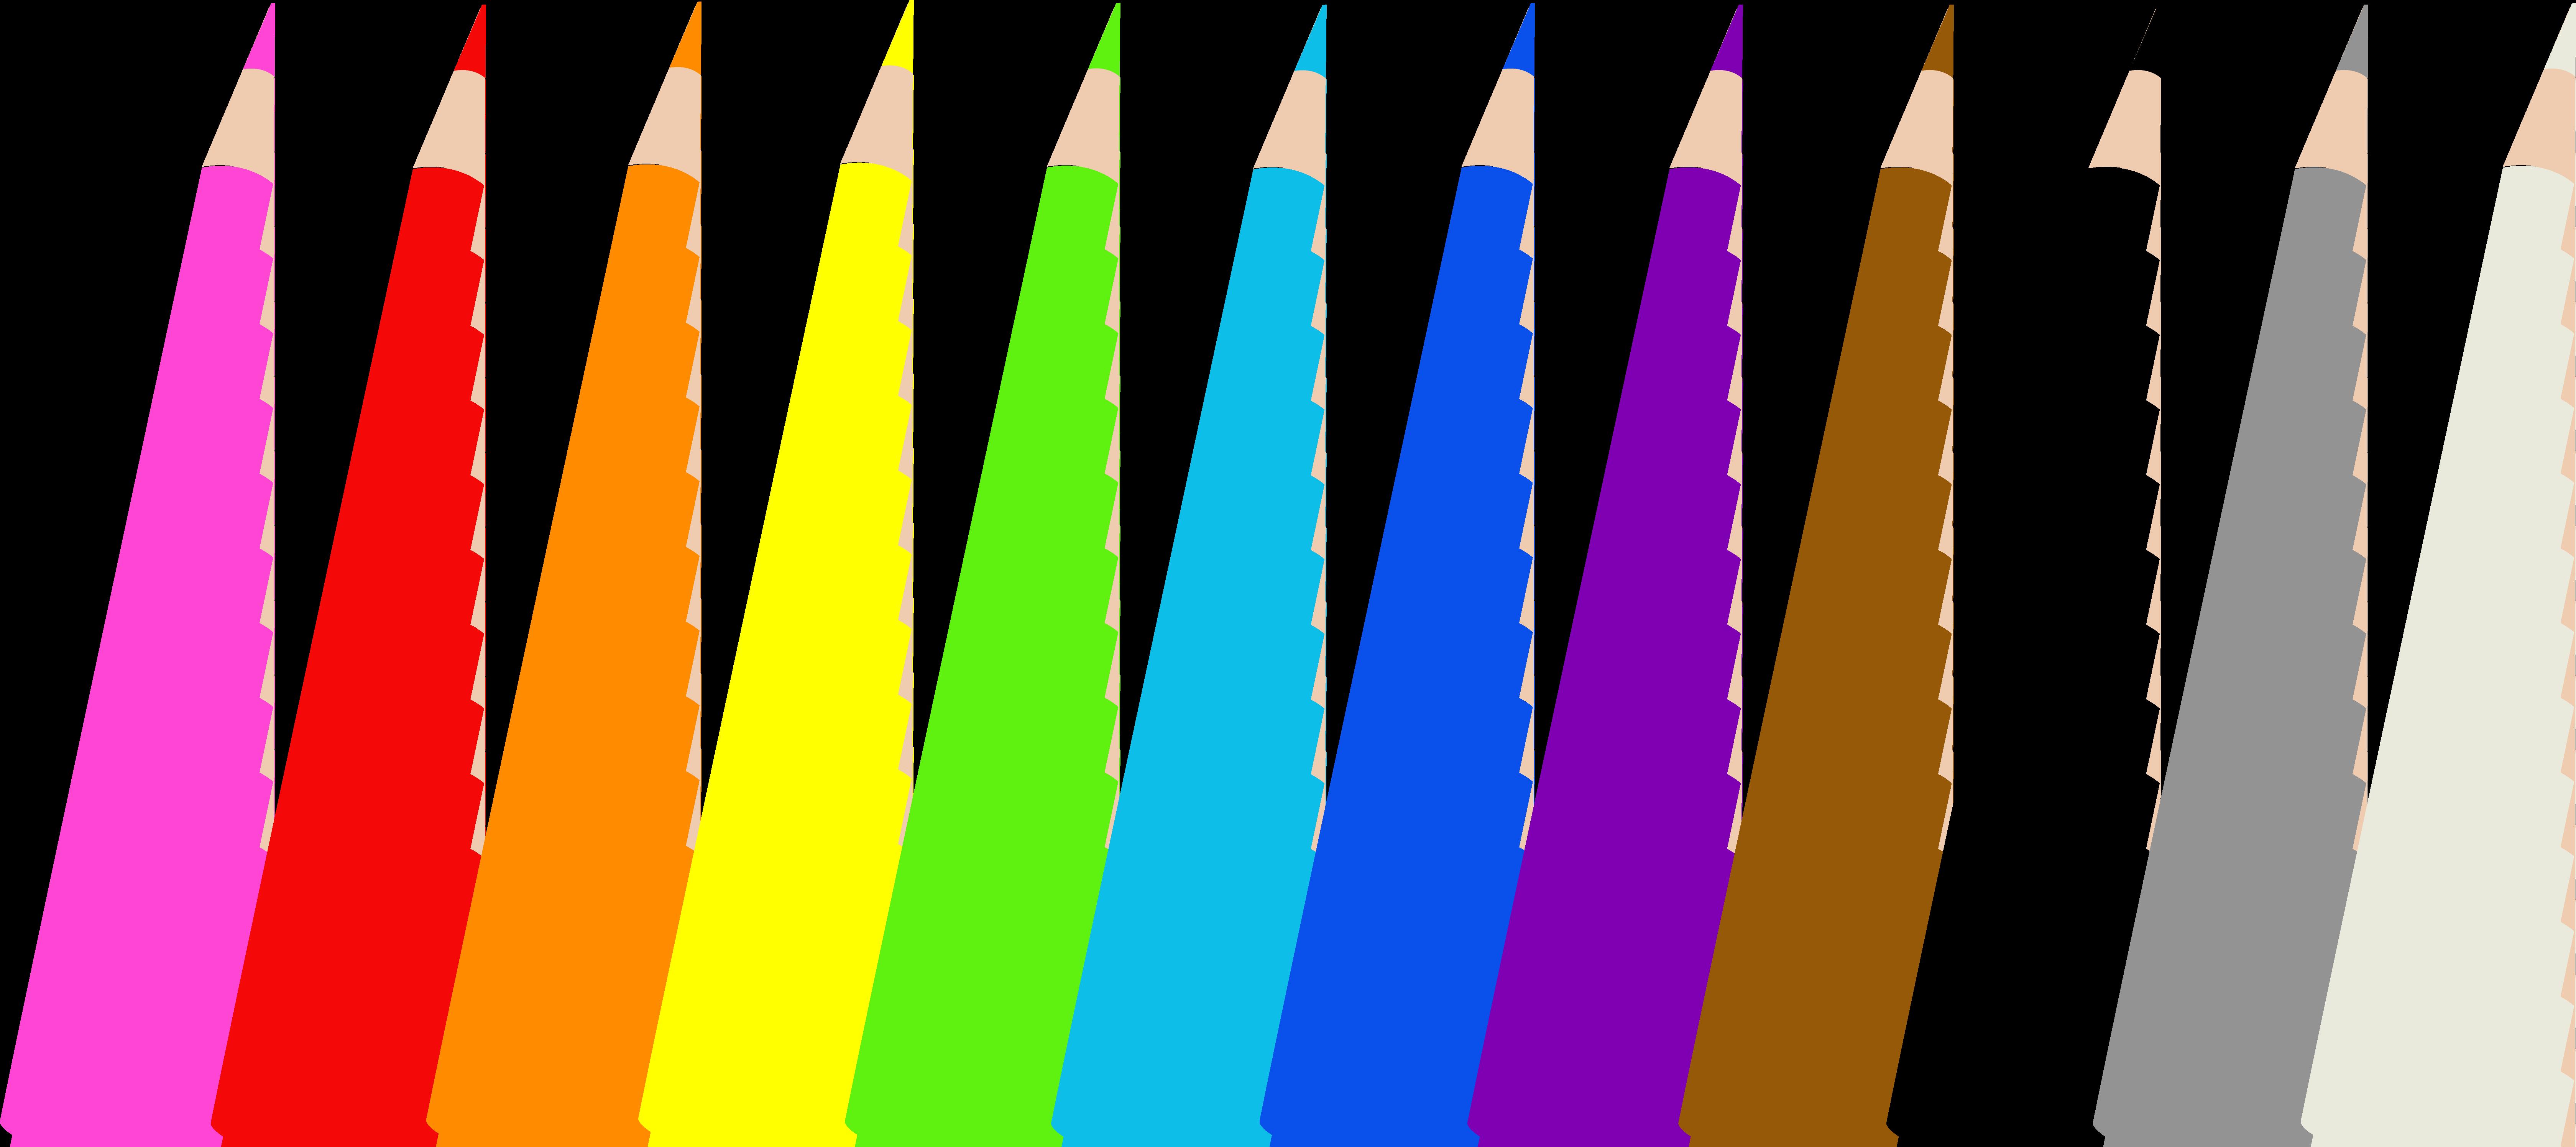 6720x2993 Colored Pencils Clipart